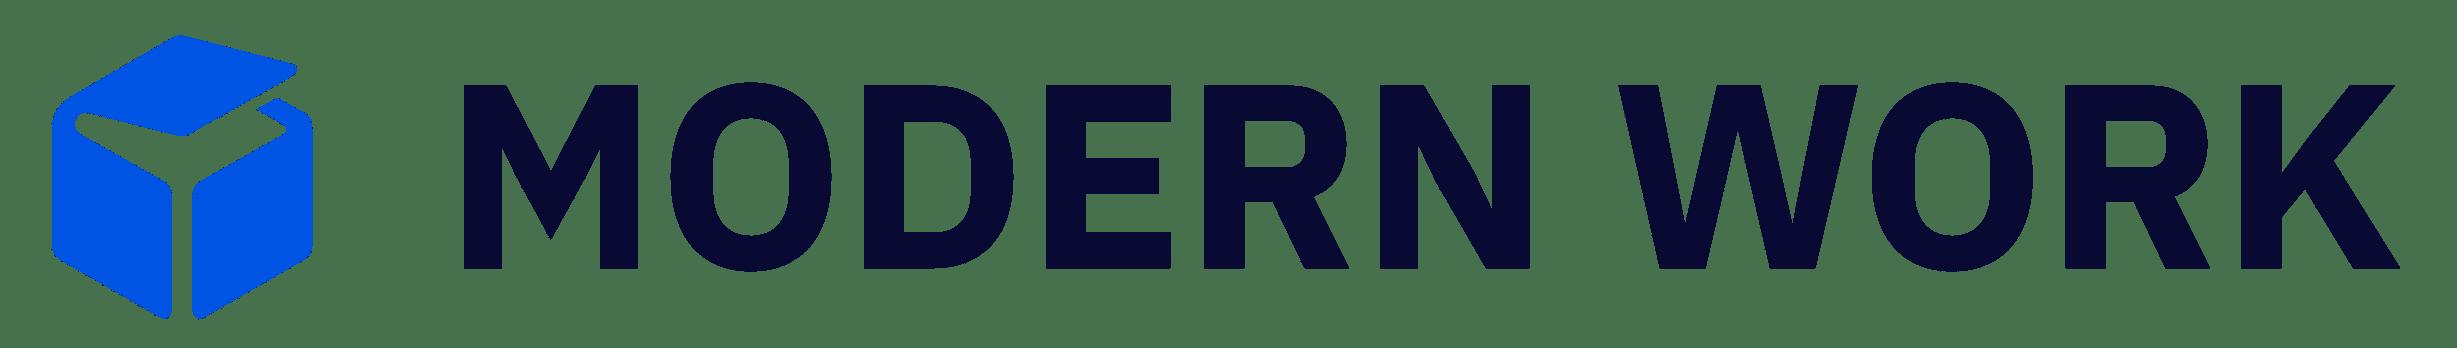 modern-work-logo